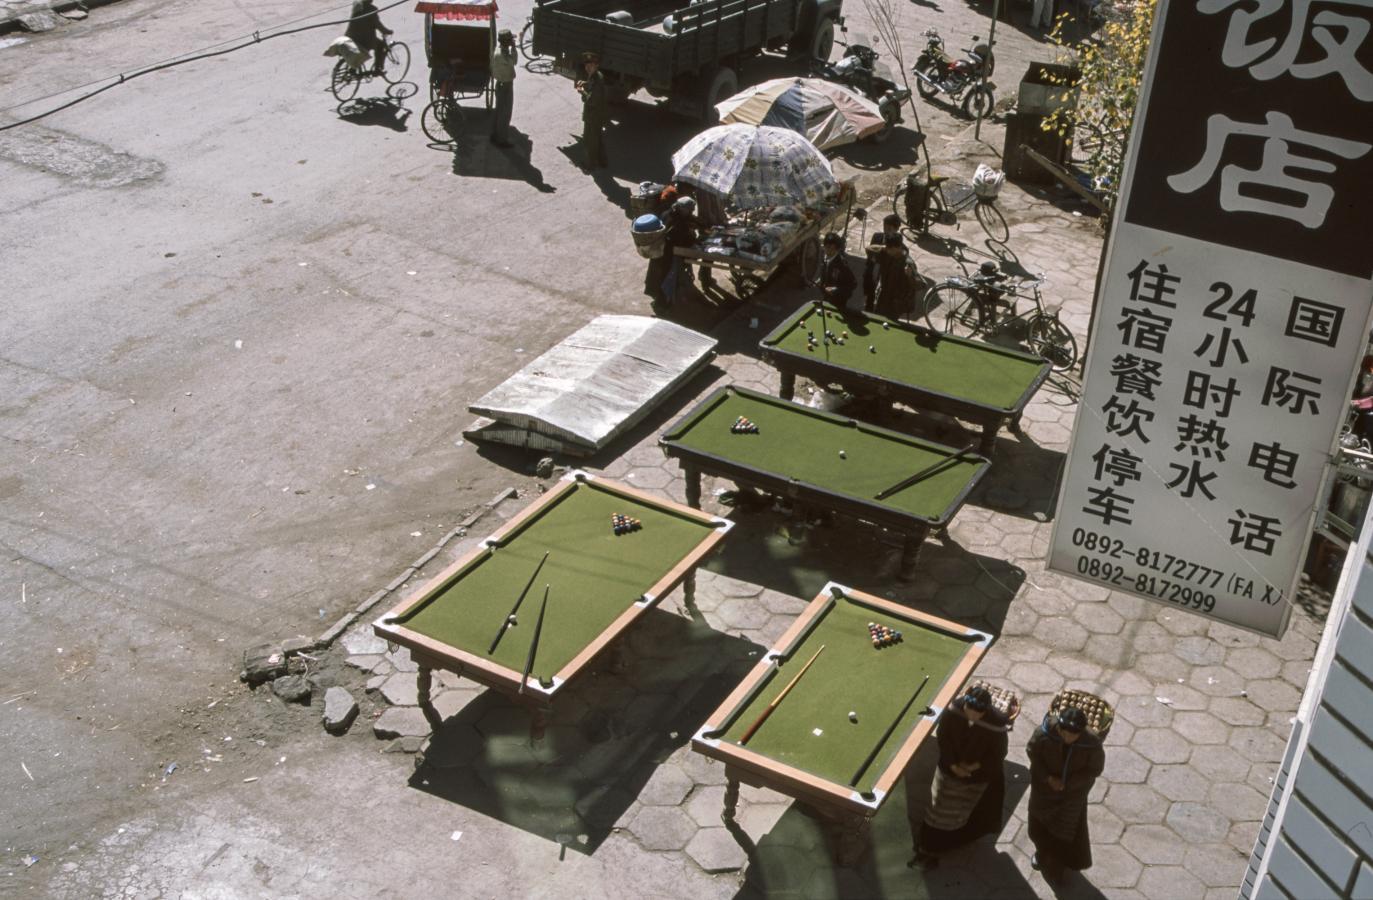 pool-tables-in-the-street-shigatse-tibet-2000-